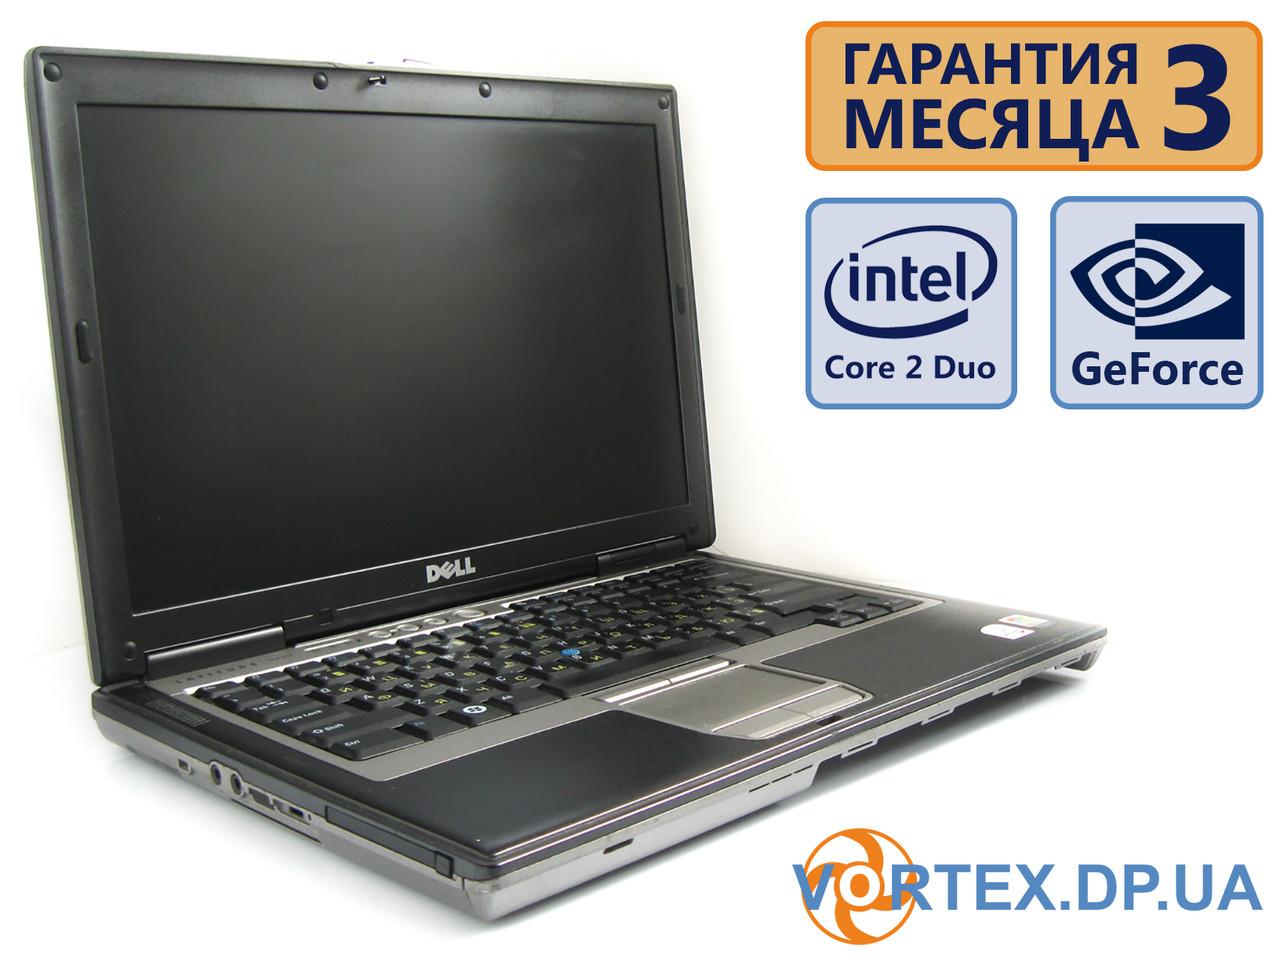 Ноутбук Dell Latitude D620 COM-port 14.1 (1280x800)/Intel Core 2 Duo T2400 (2x1.83GHz)/Quadro NVS 110M/RAM 2Gb/ HDD 80Gb/АКБ нет/Сост. 8.5/10 БУ